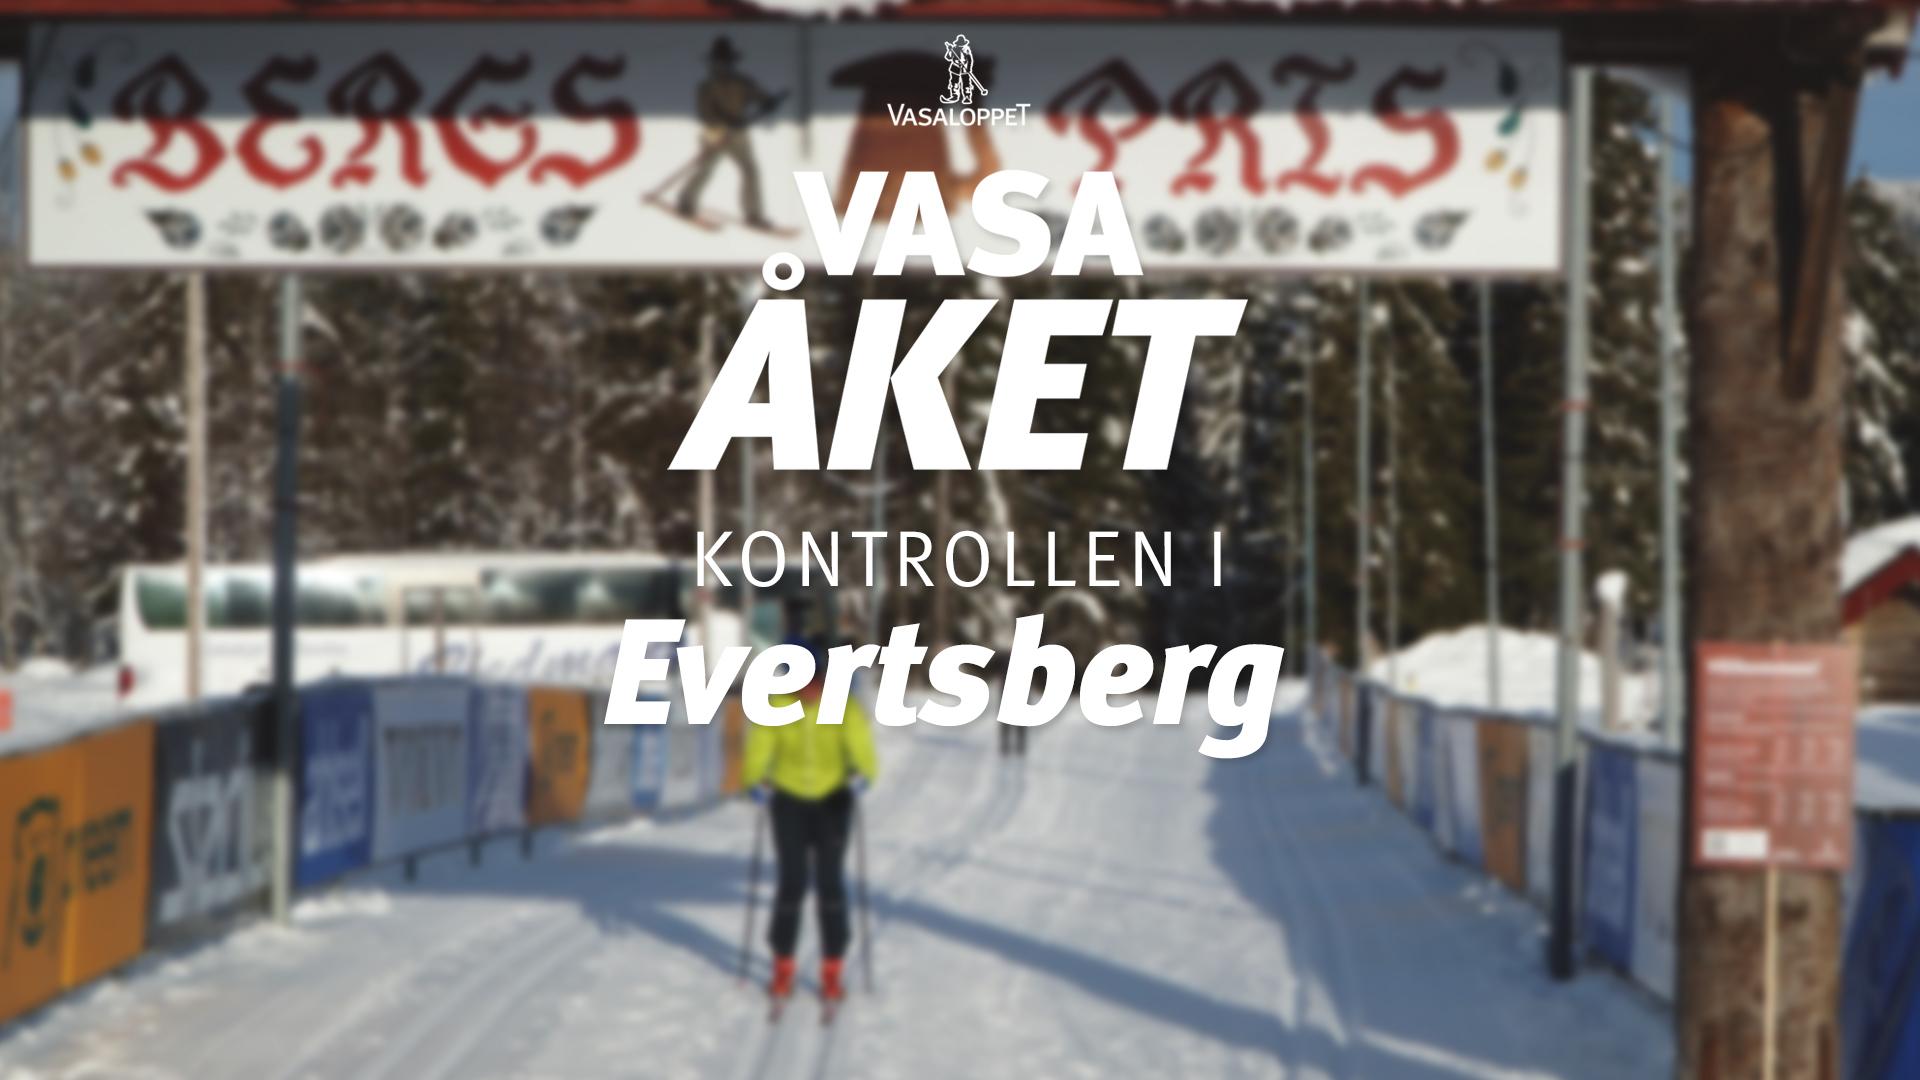 7 mars, 2021 – Evertsberg